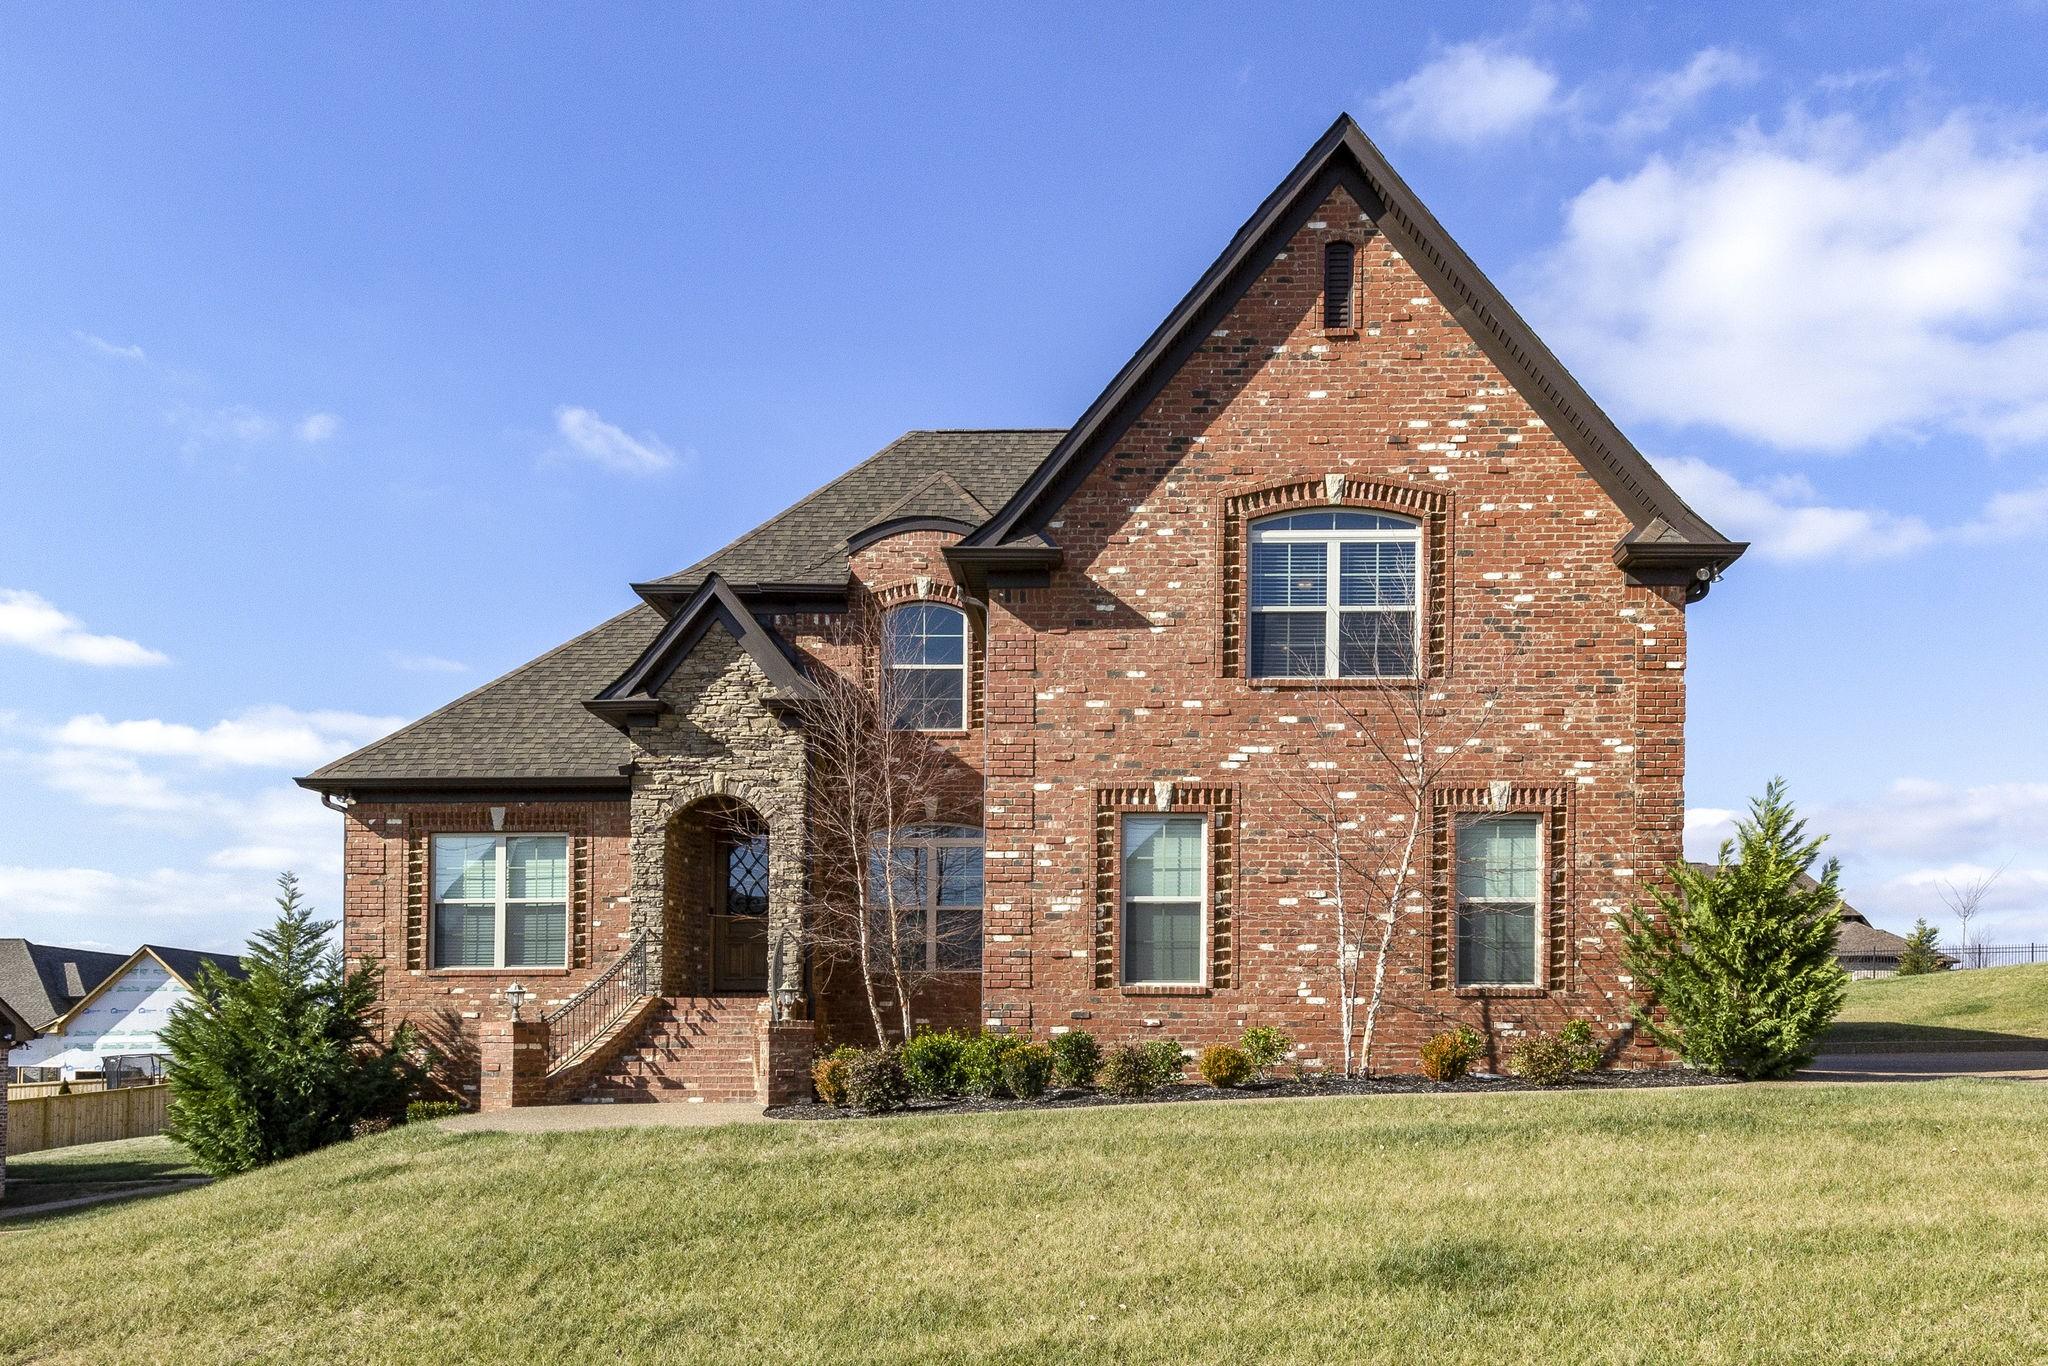 919 Harrisburg Ln, Mount Juliet, TN 37122 - Mount Juliet, TN real estate listing